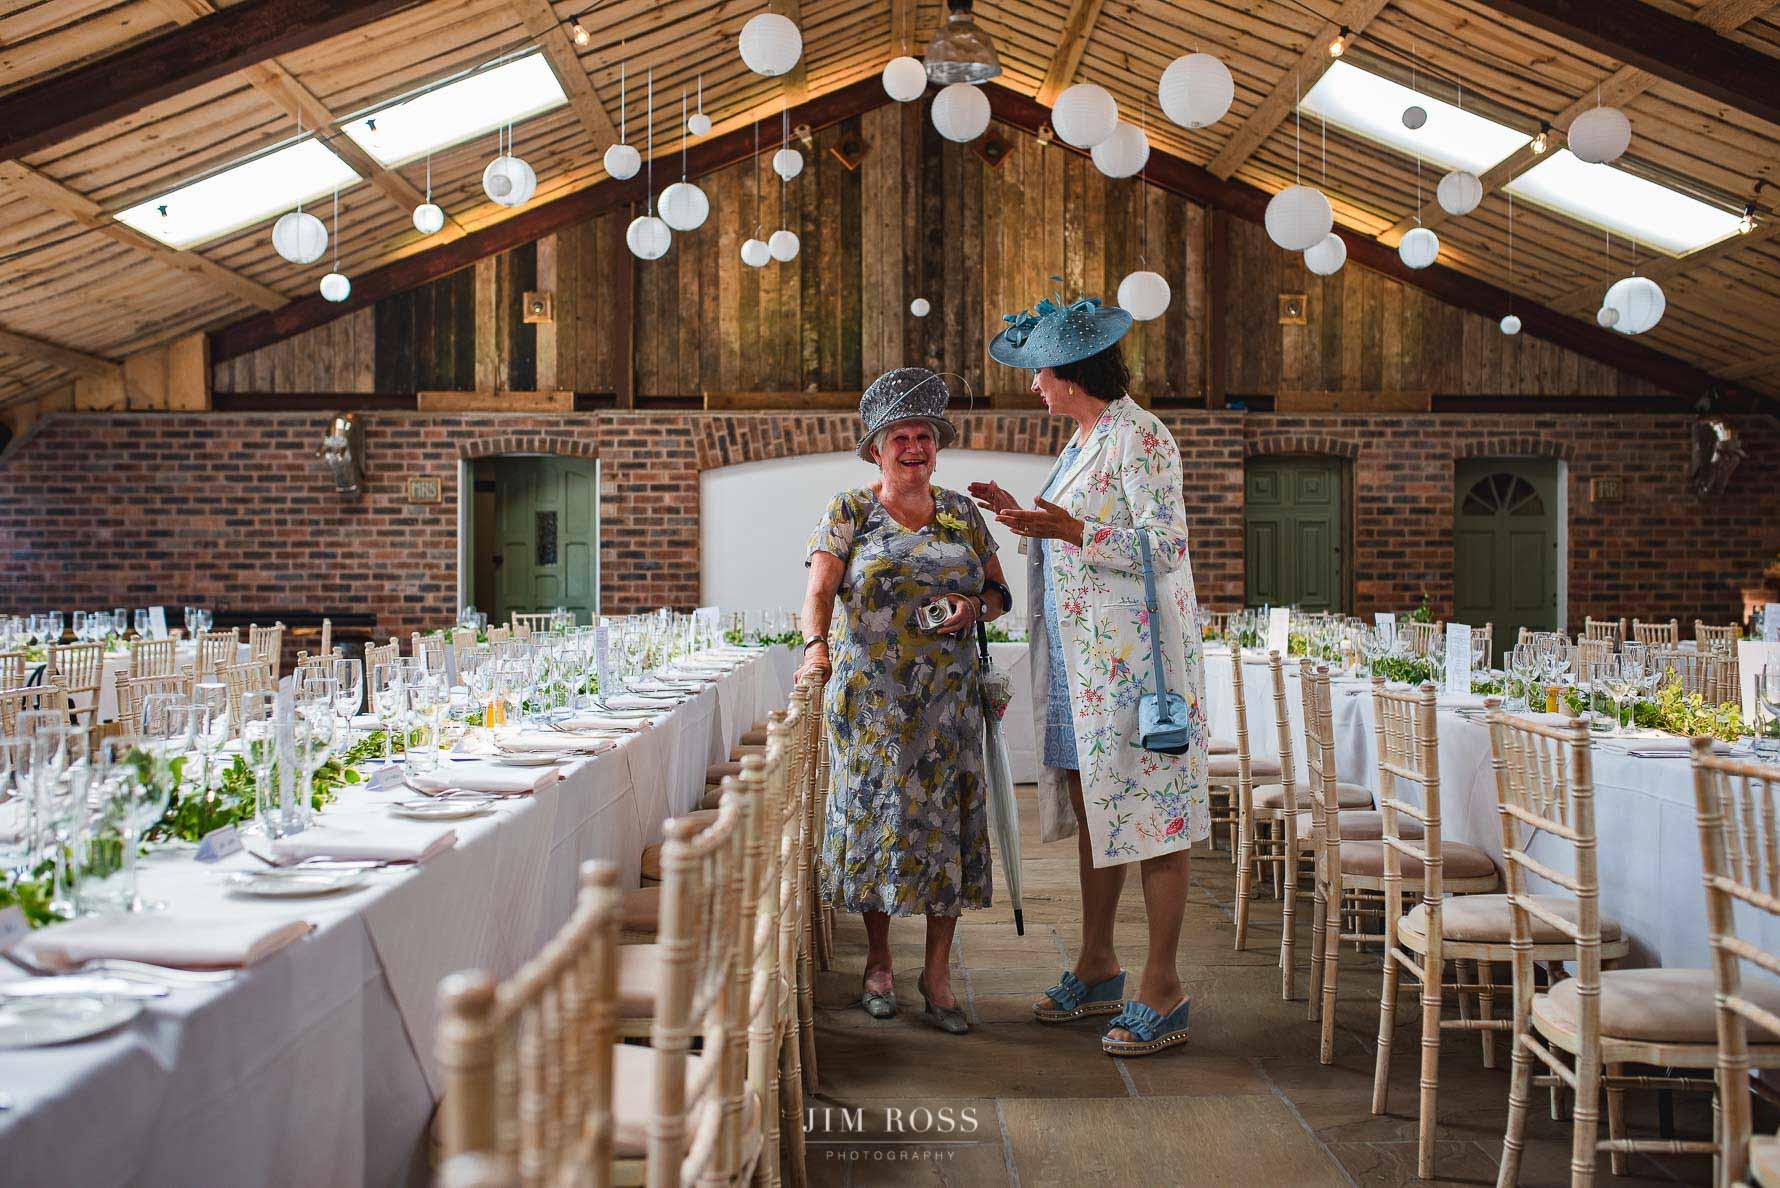 Ladies inspecting the wedding breakfast room